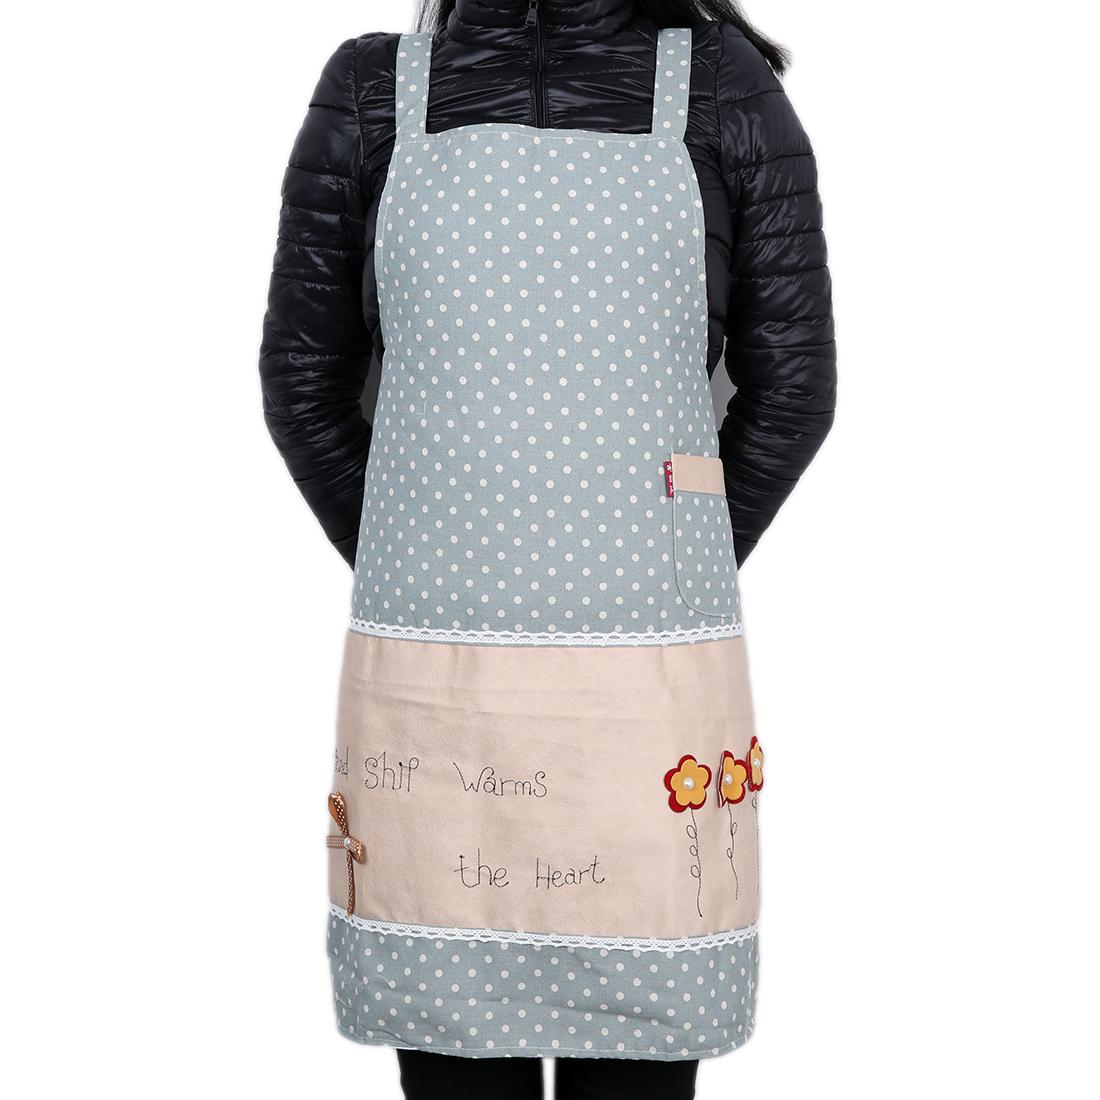 Polka Dot Lady Chefs Butchers Apron Kitchen Bib Cooking Craft